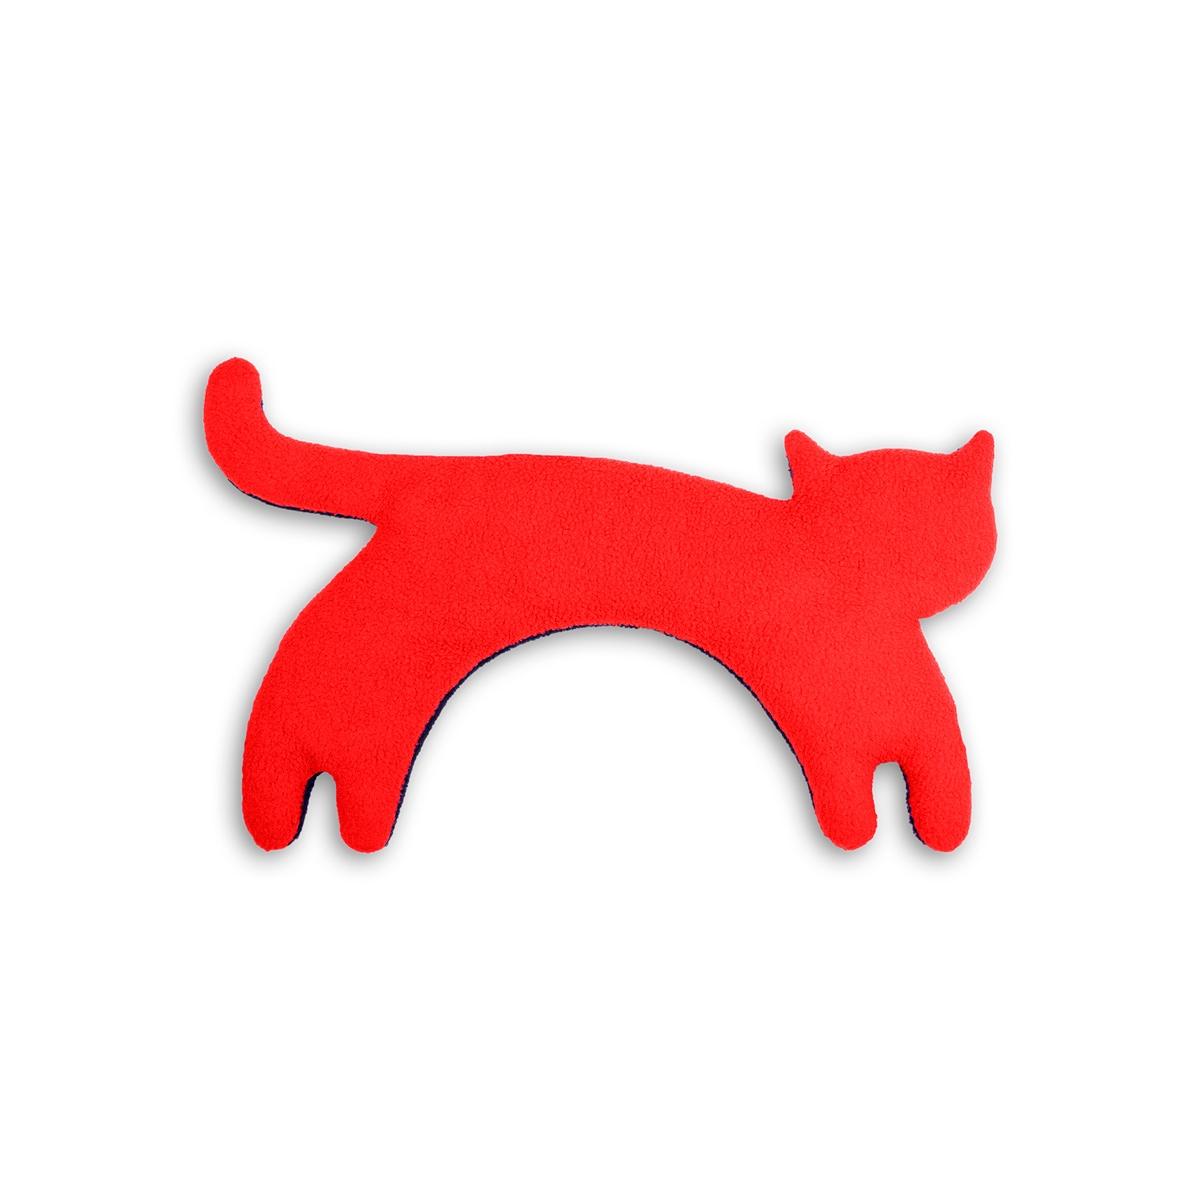 Leschi Wärmekissen Katze Minina liegend